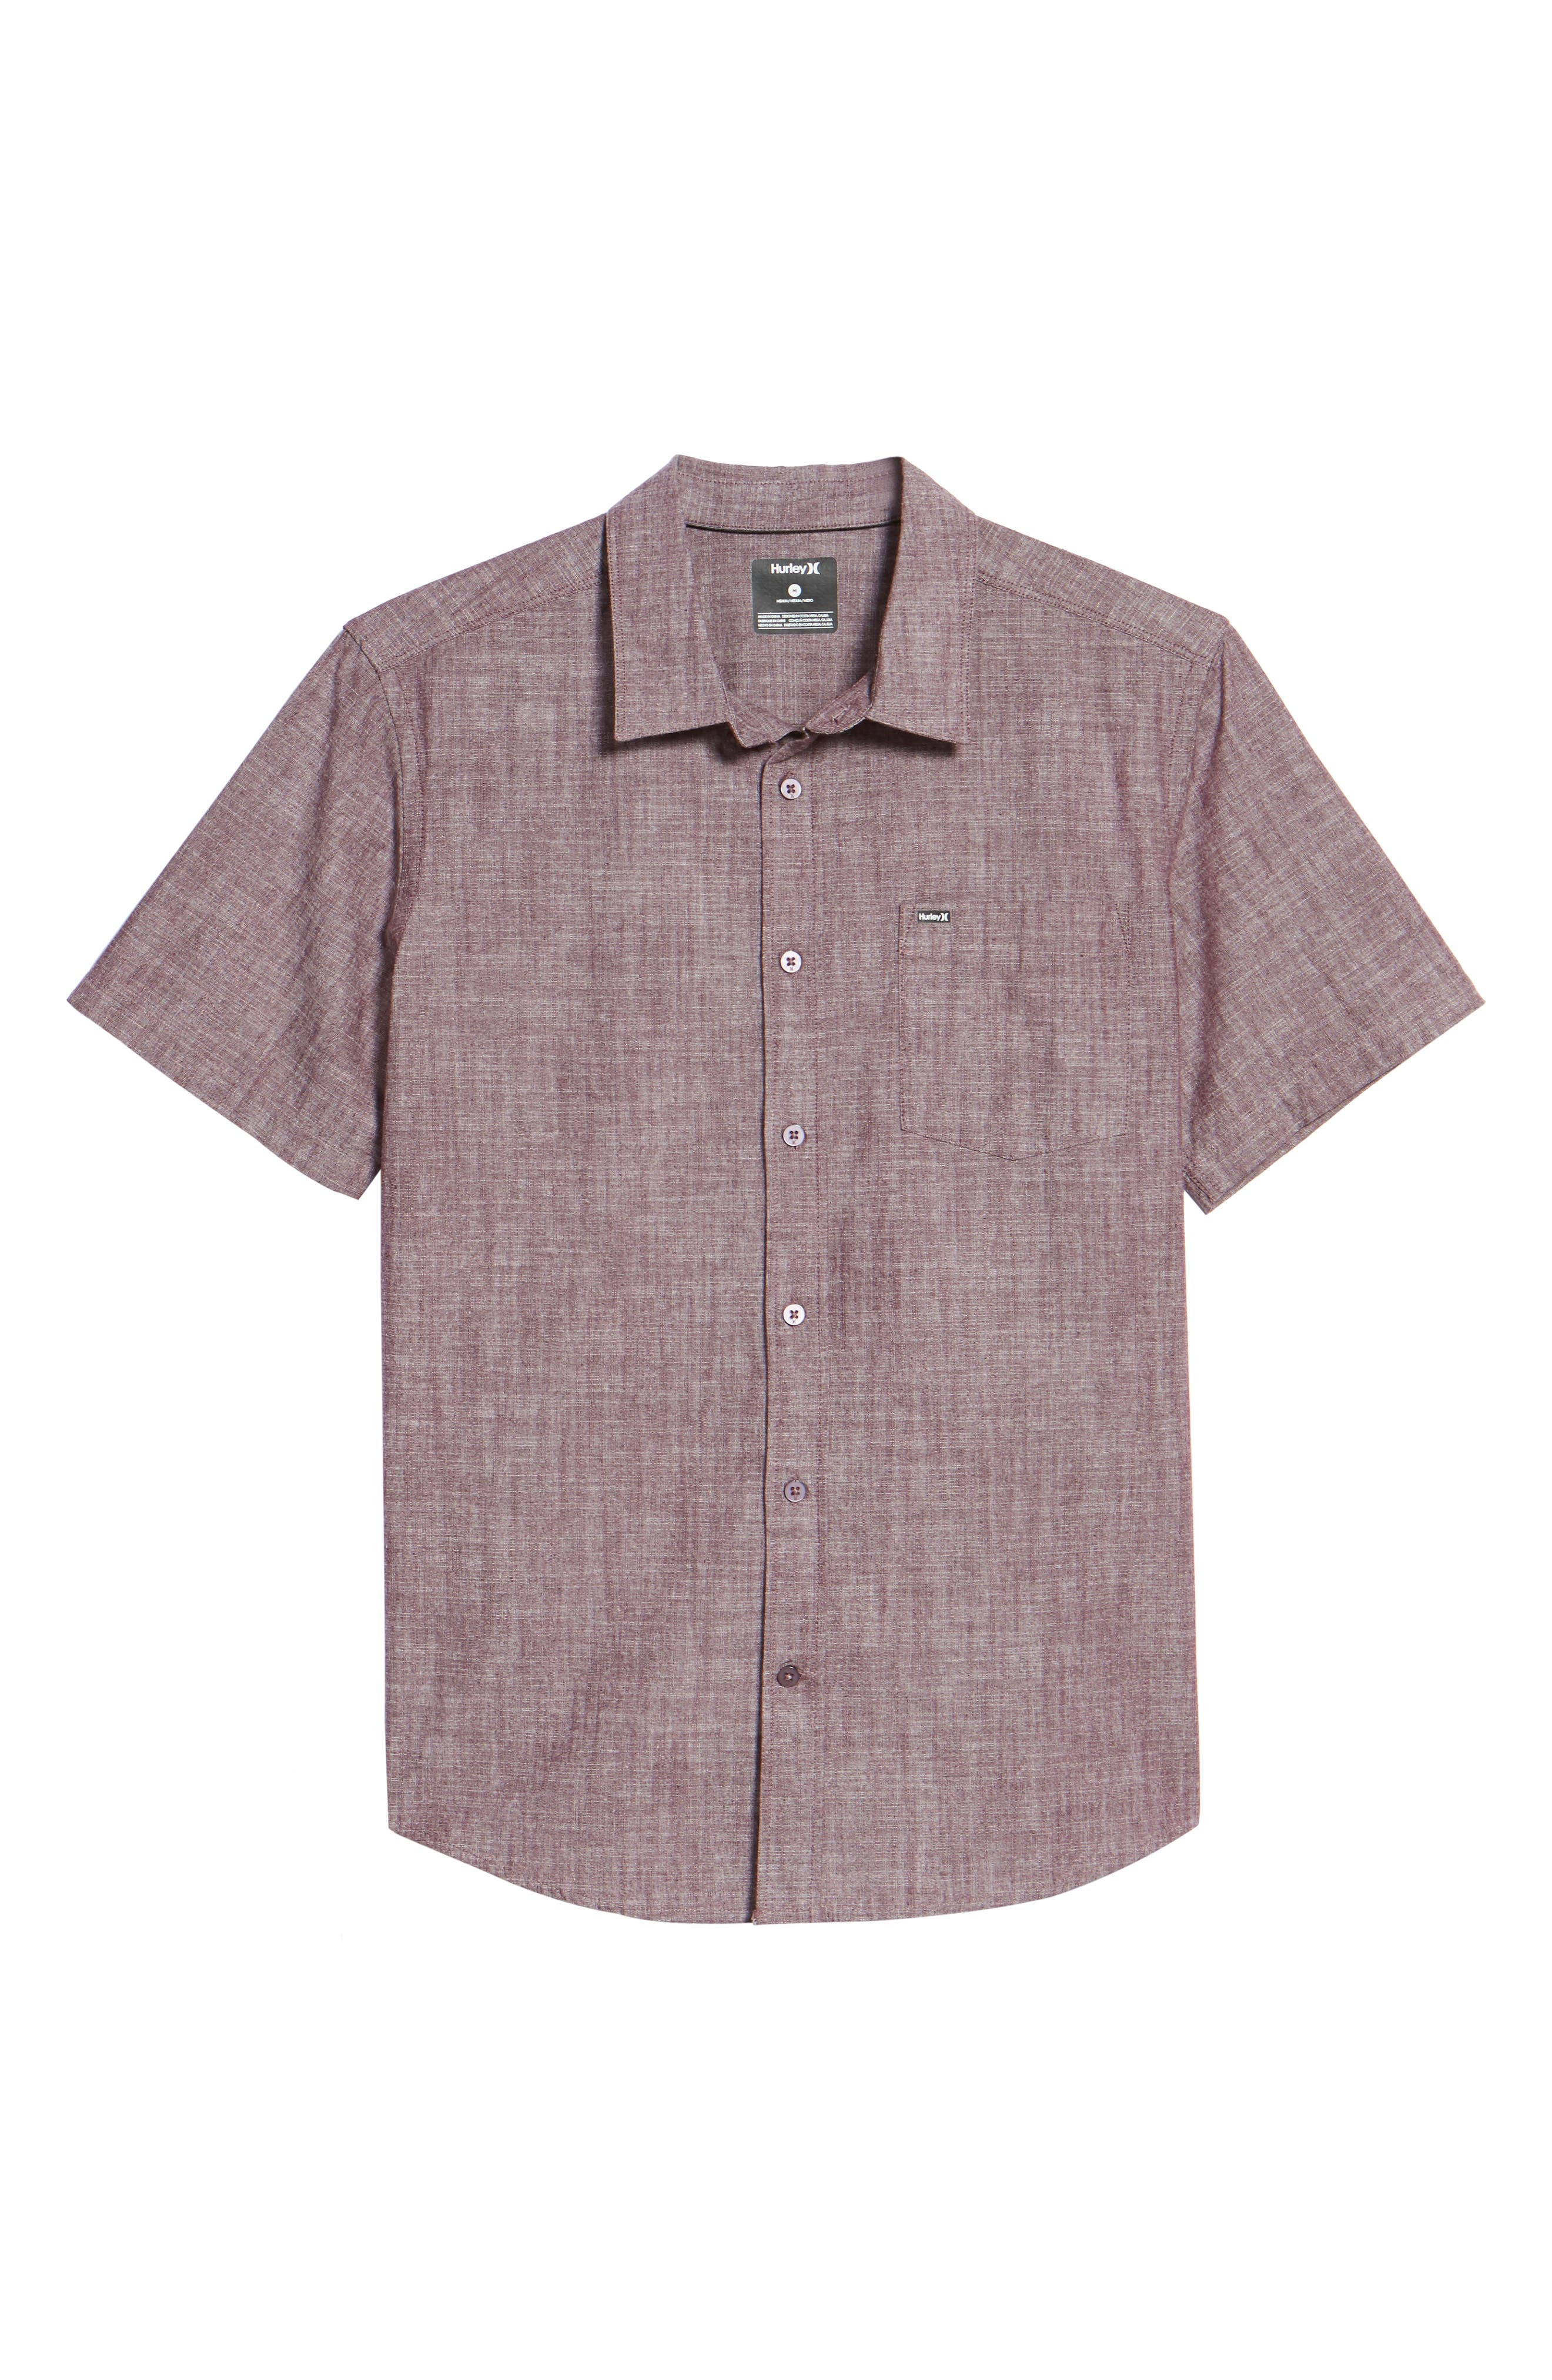 O & O 3.0 Woven Shirt,                             Alternate thumbnail 6, color,                             644